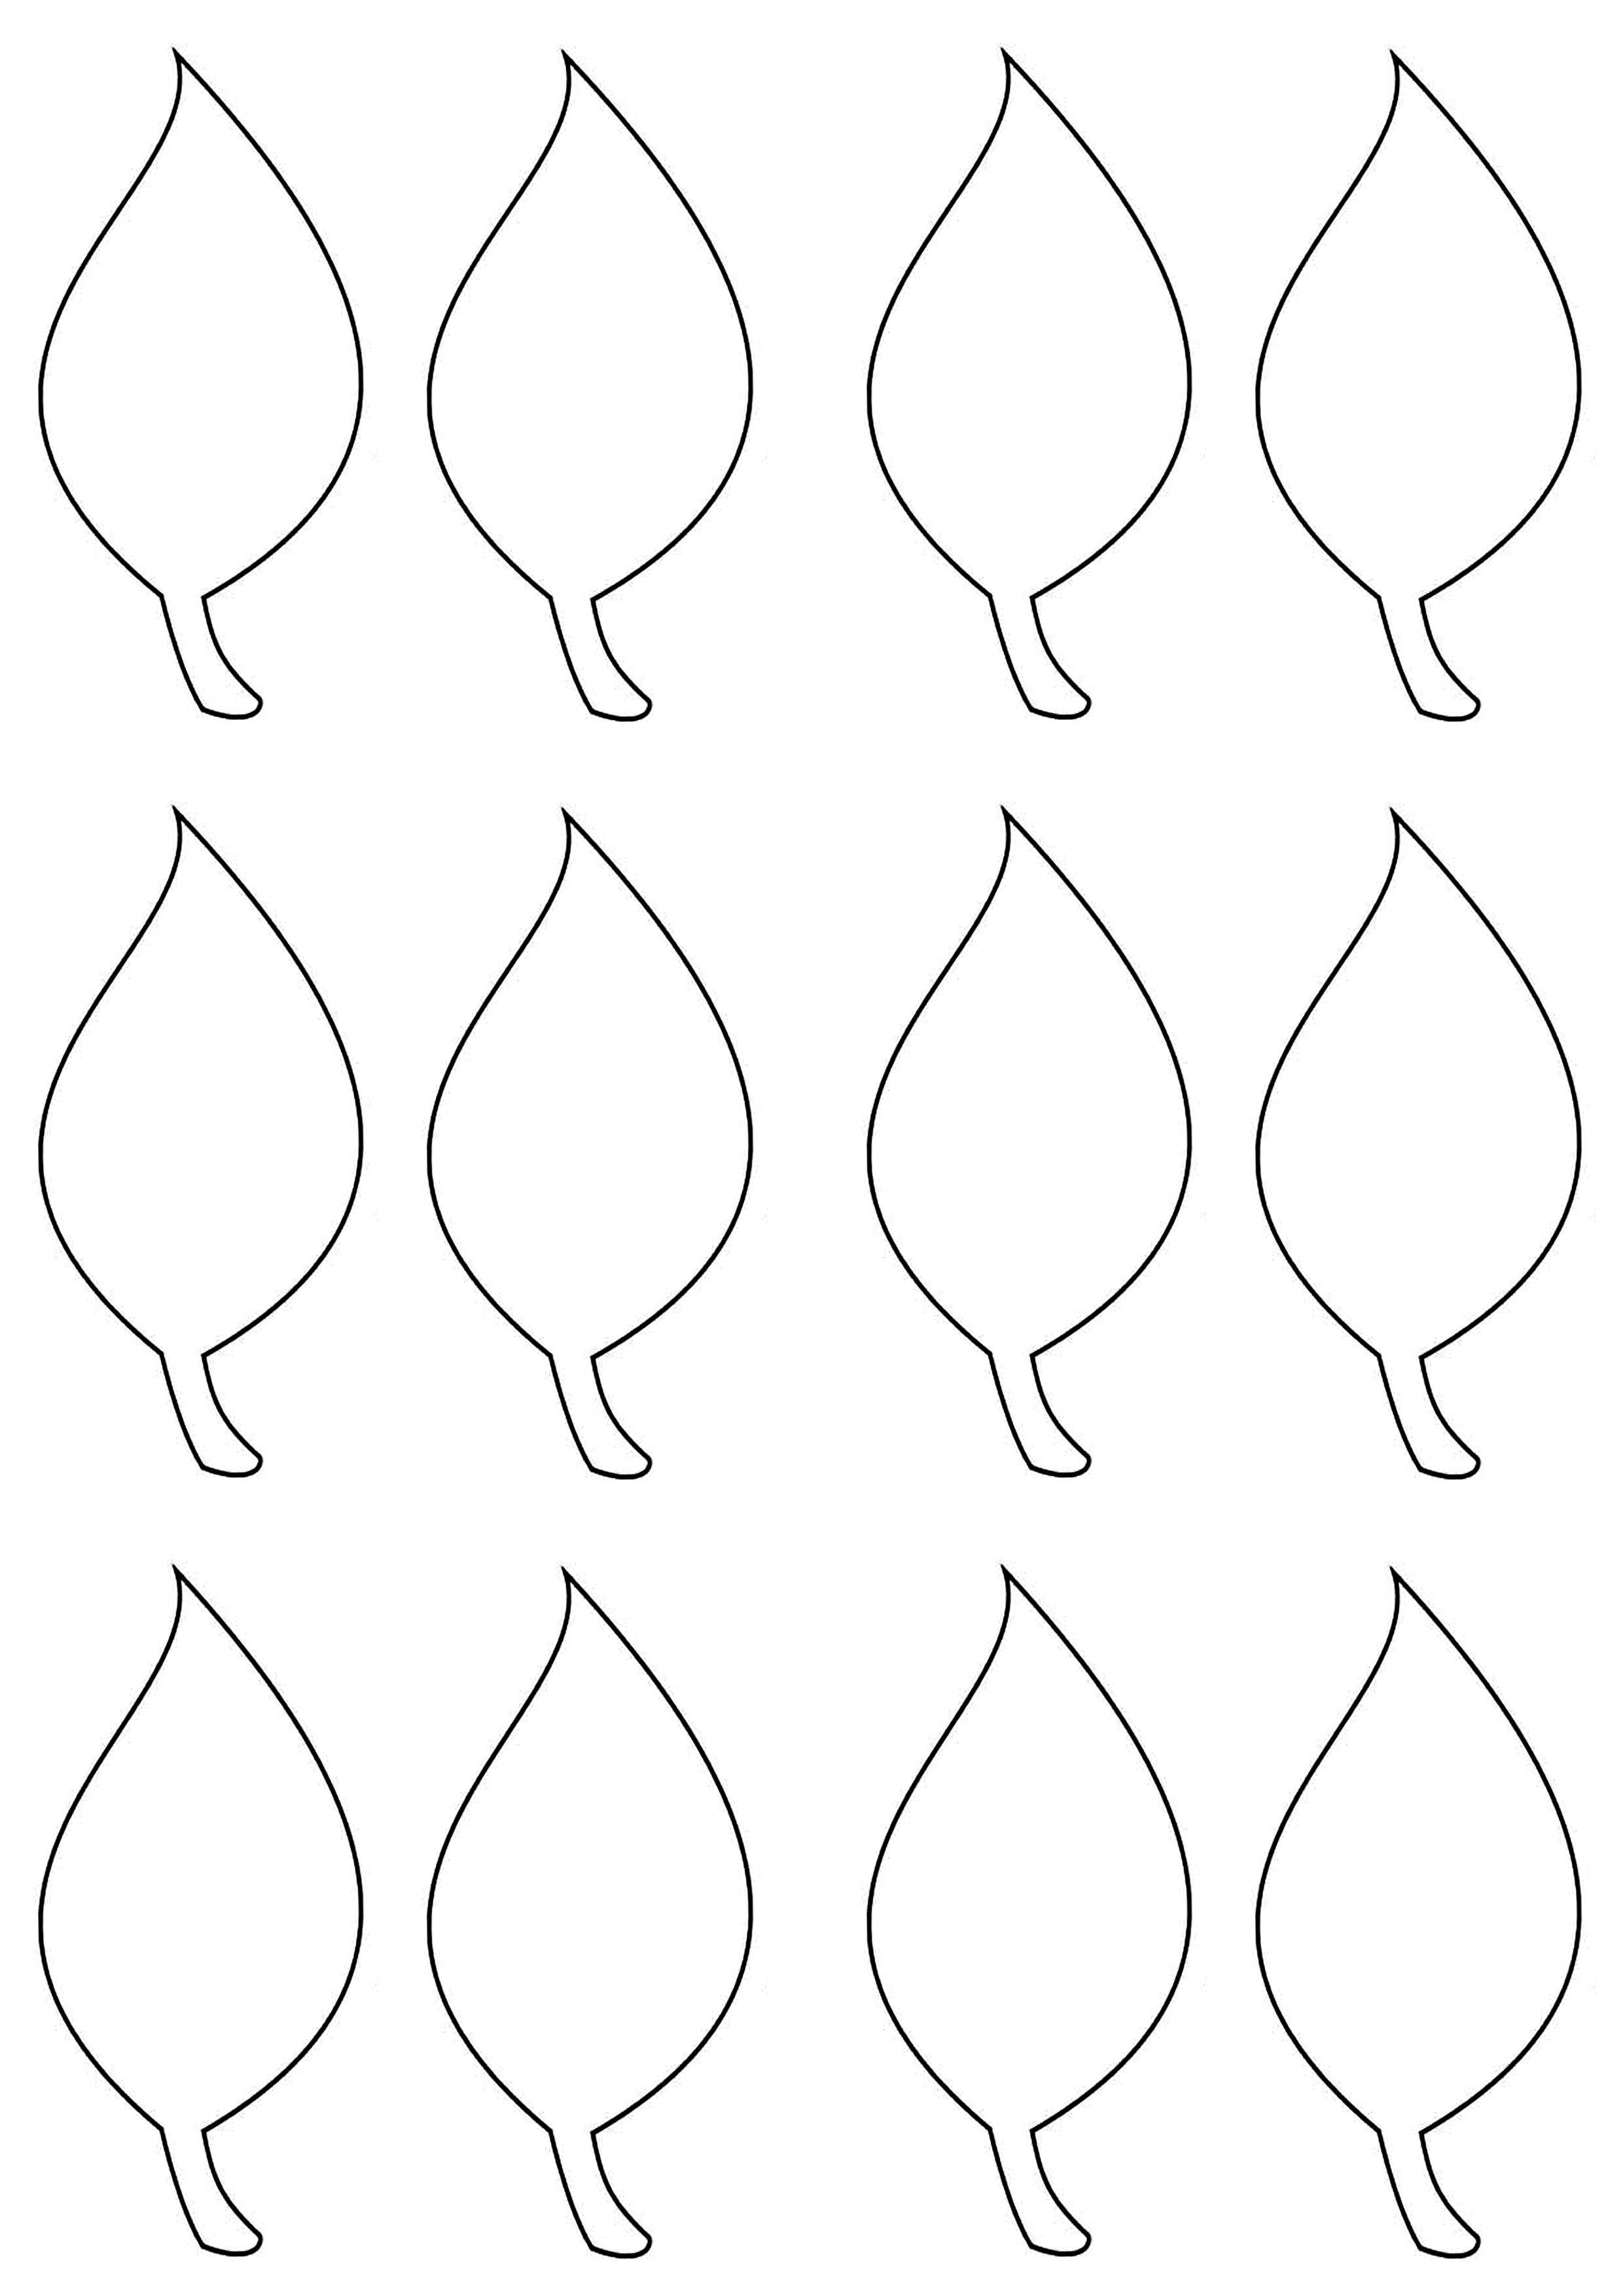 003 Simple Leaf Template With Line Sample  Fall Printable BlankFull